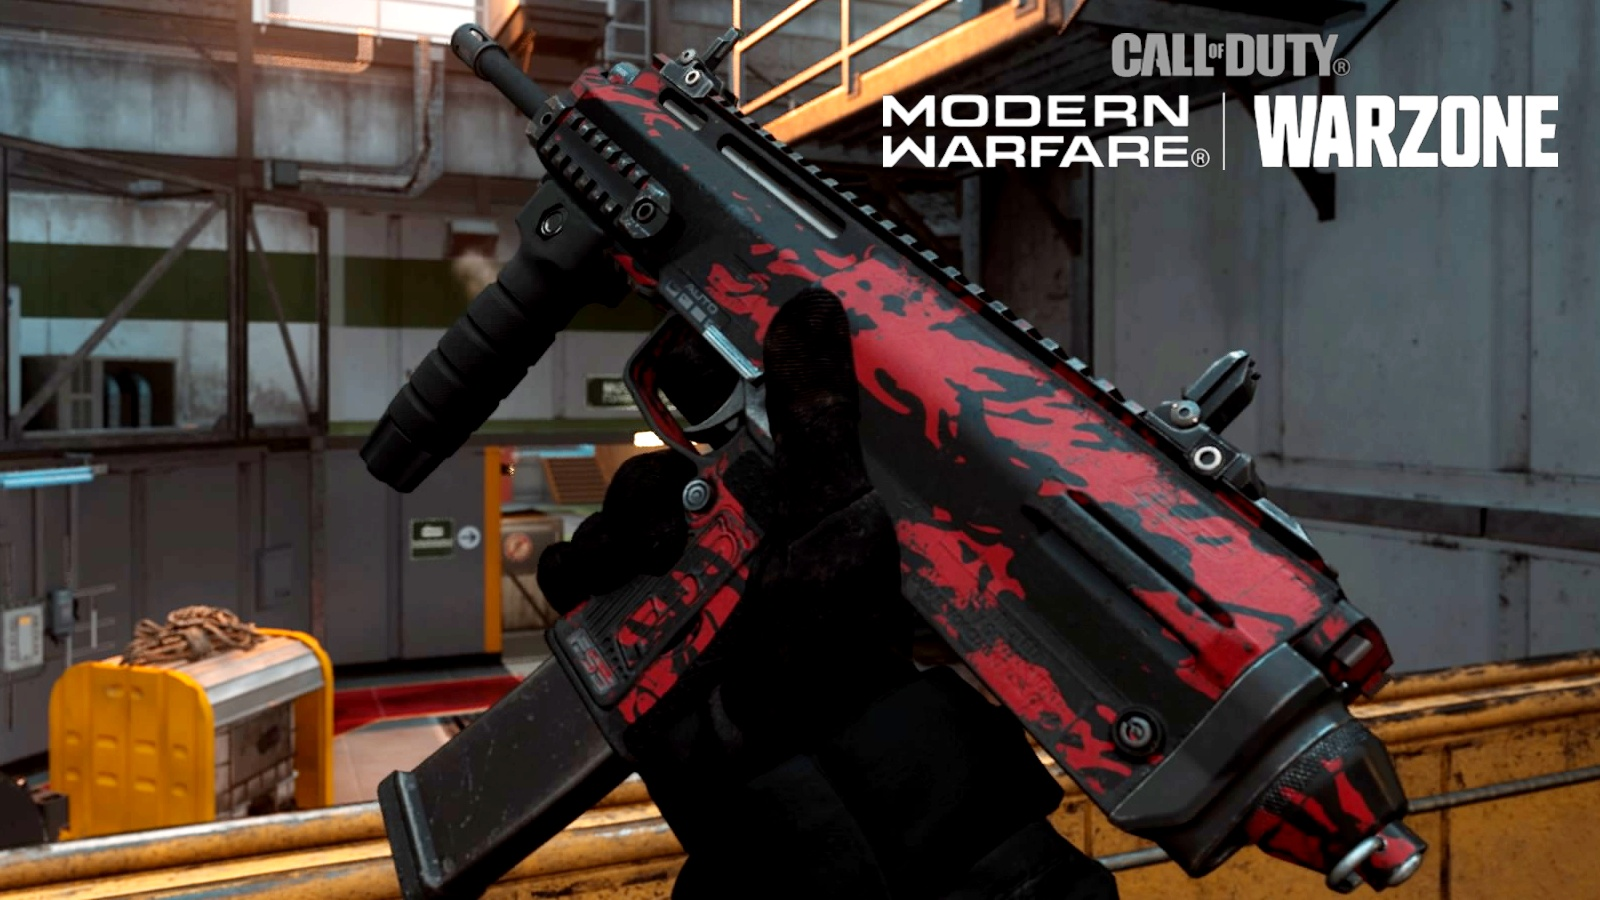 MP7 weapon inspect Modern Warfare and Warzone